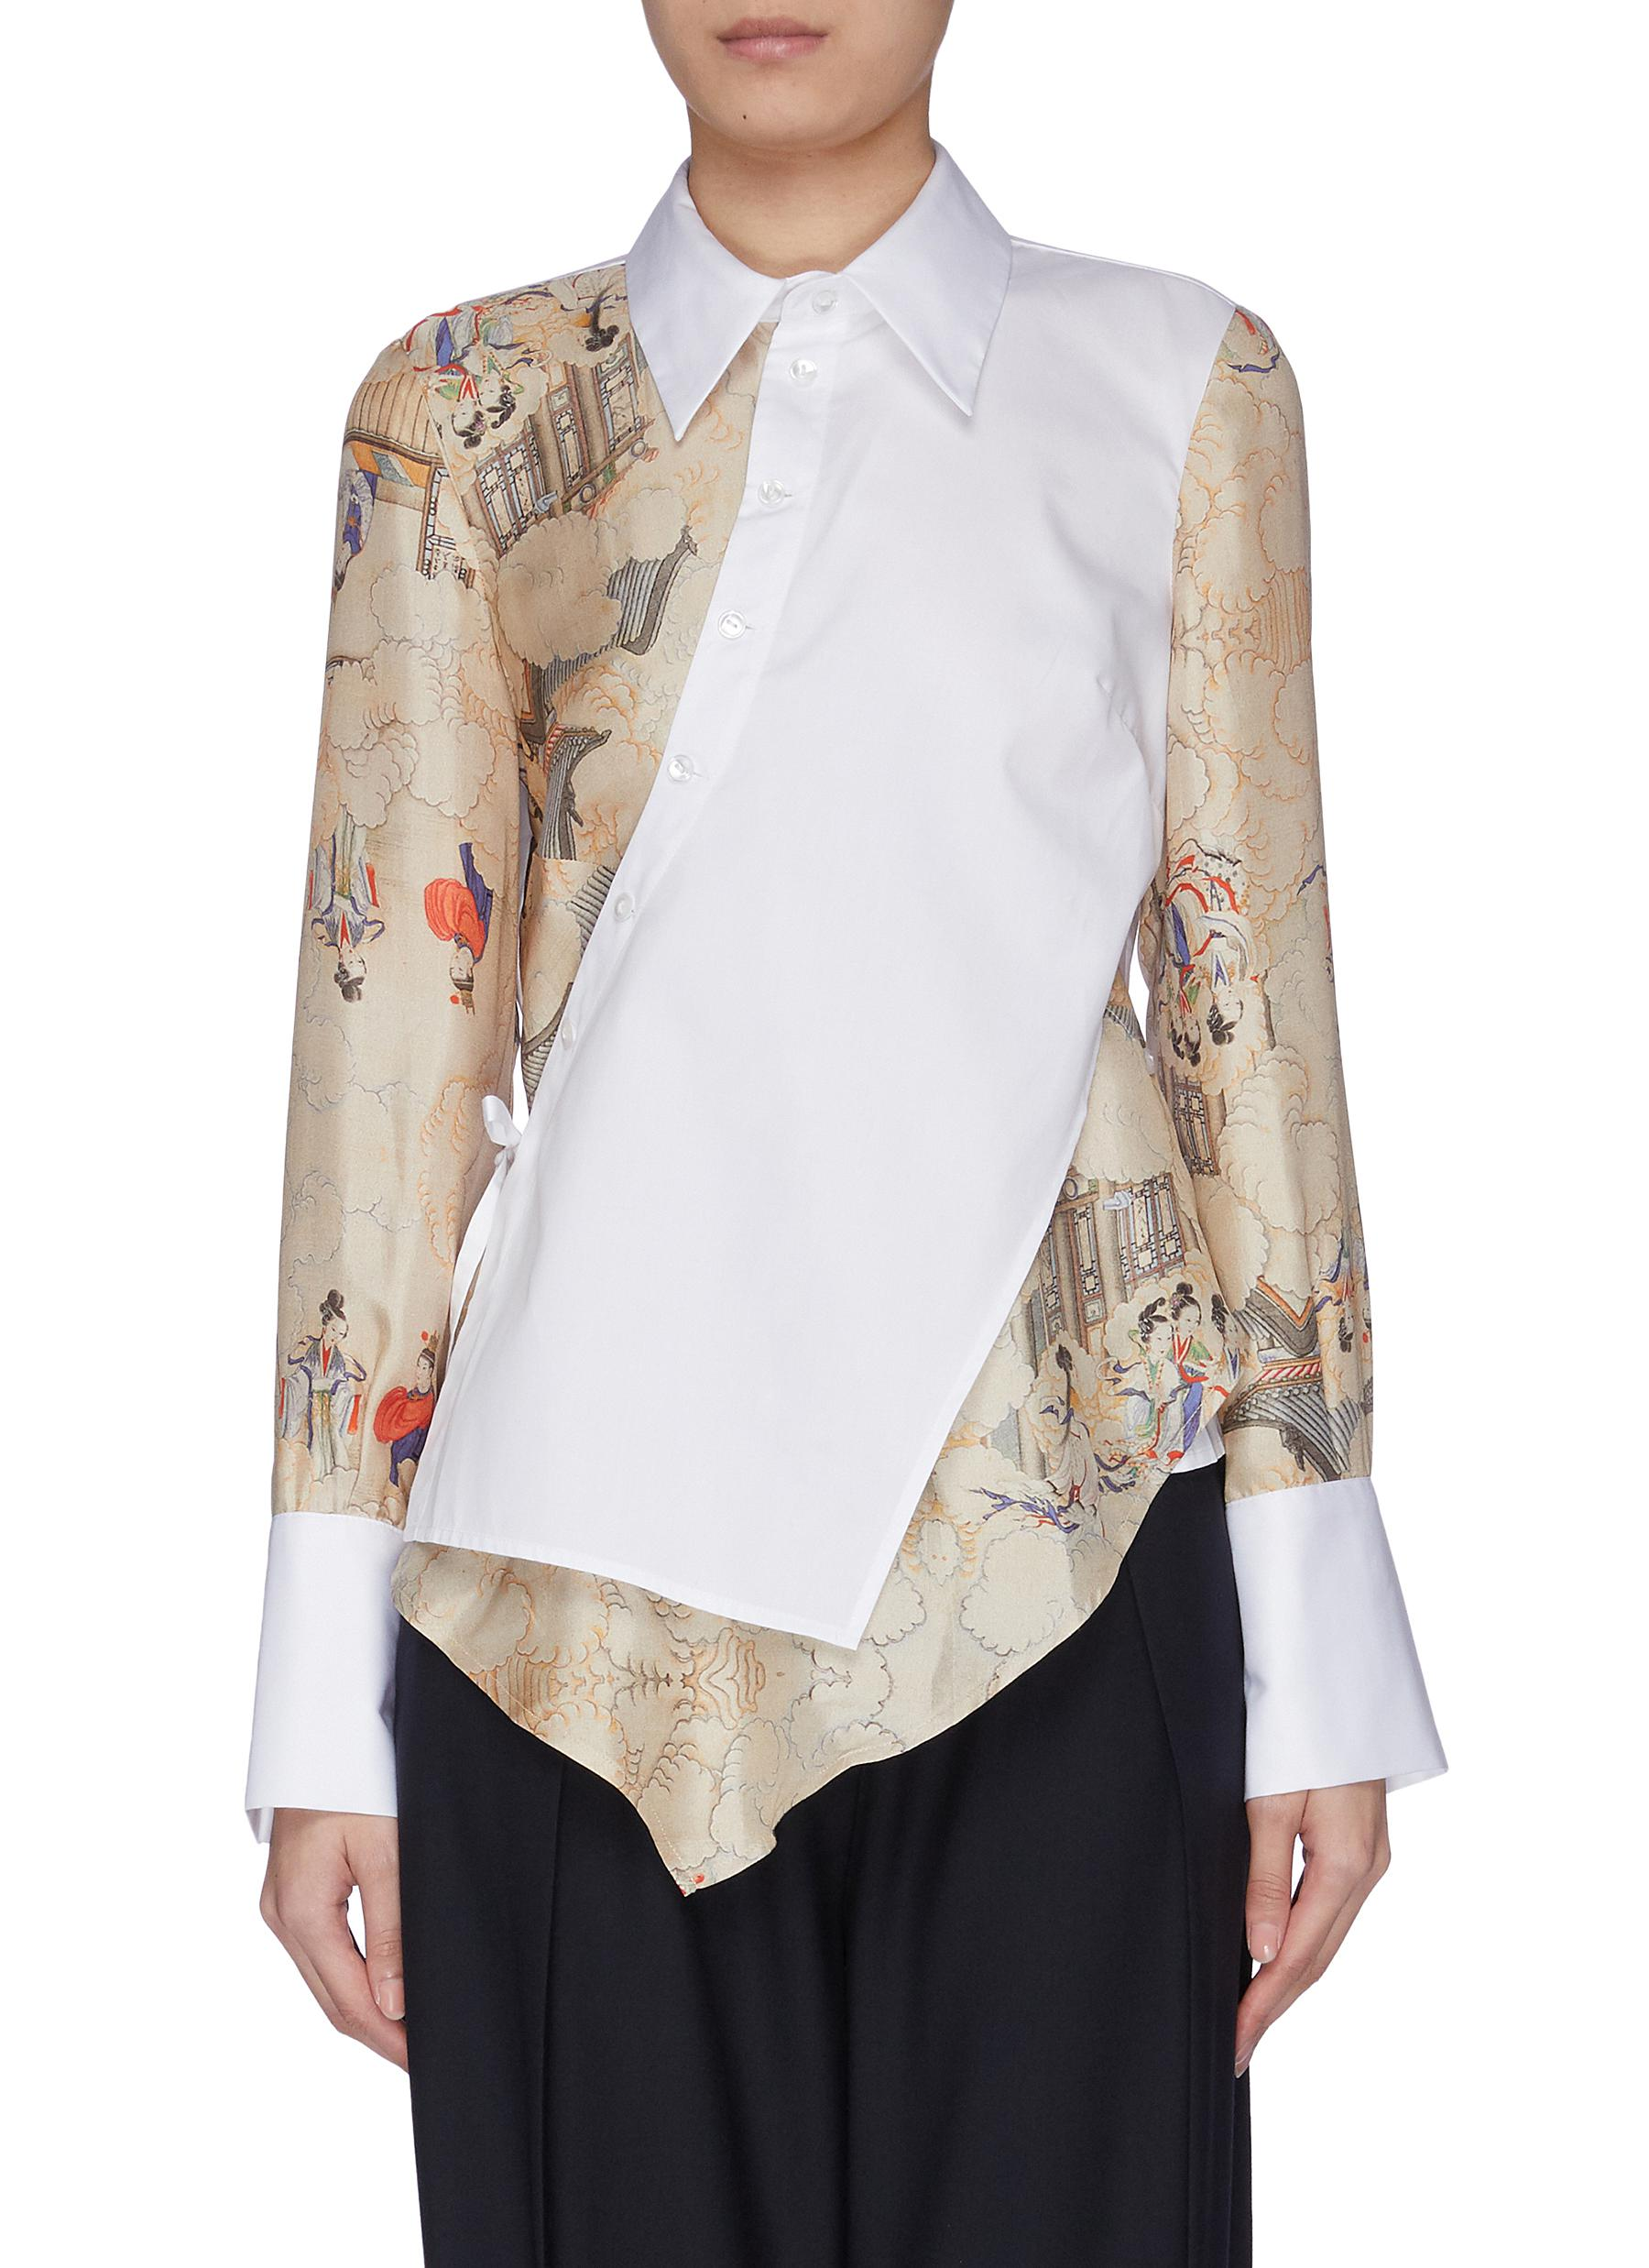 Locust asymmetric placket shirt by Snow Xue Gao